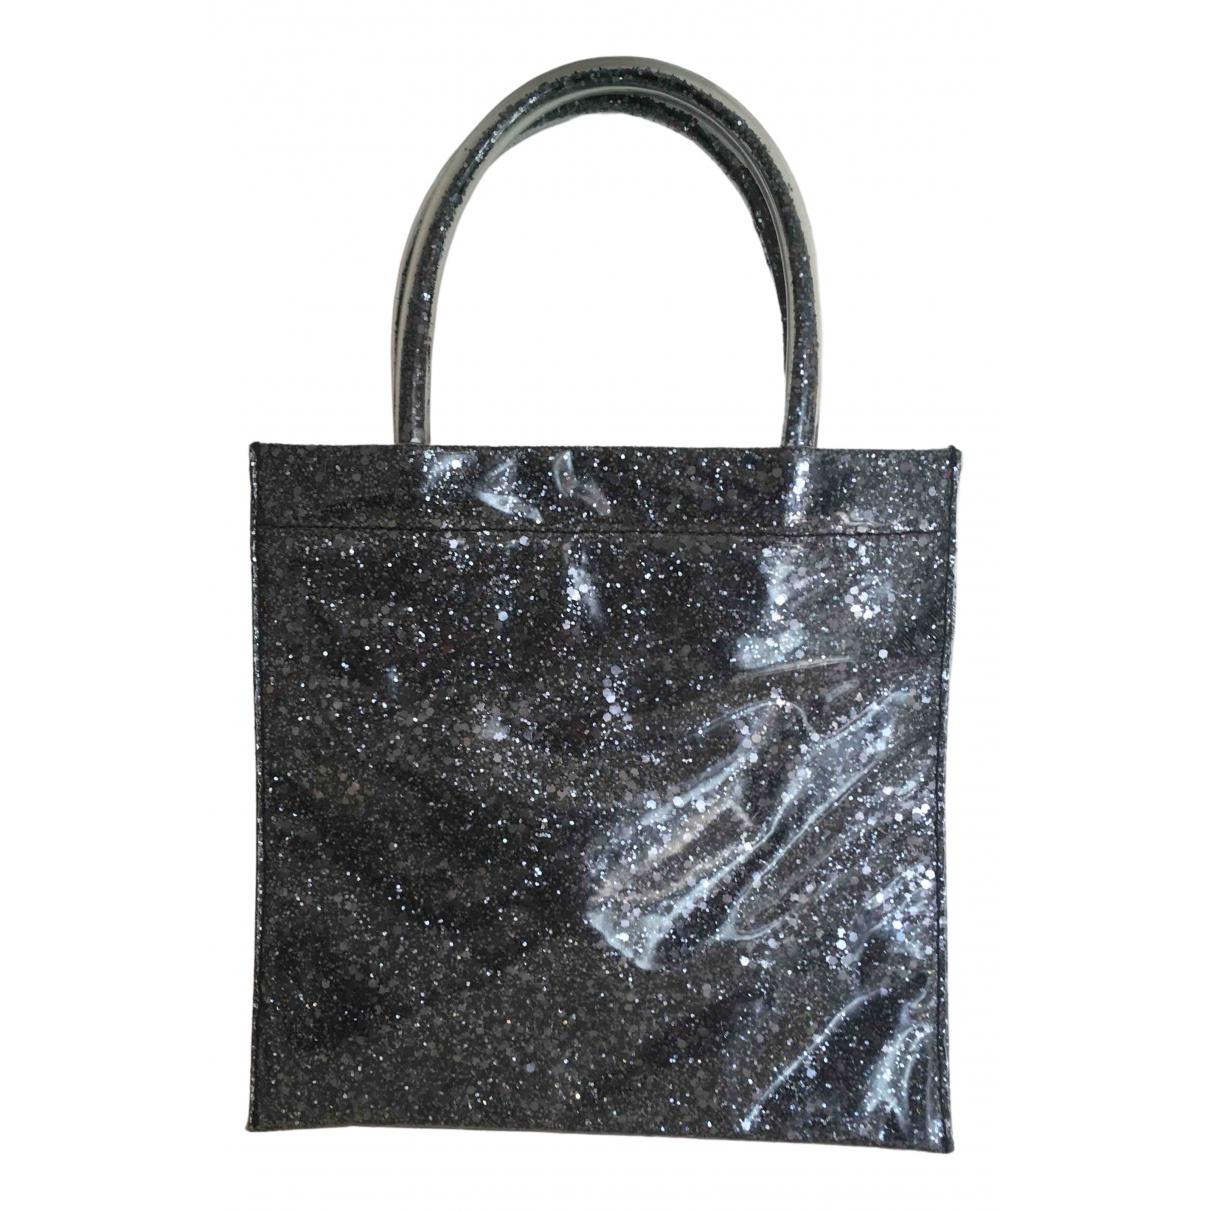 Miu Miu \N Handtasche in  Anthrazit Kunststoff